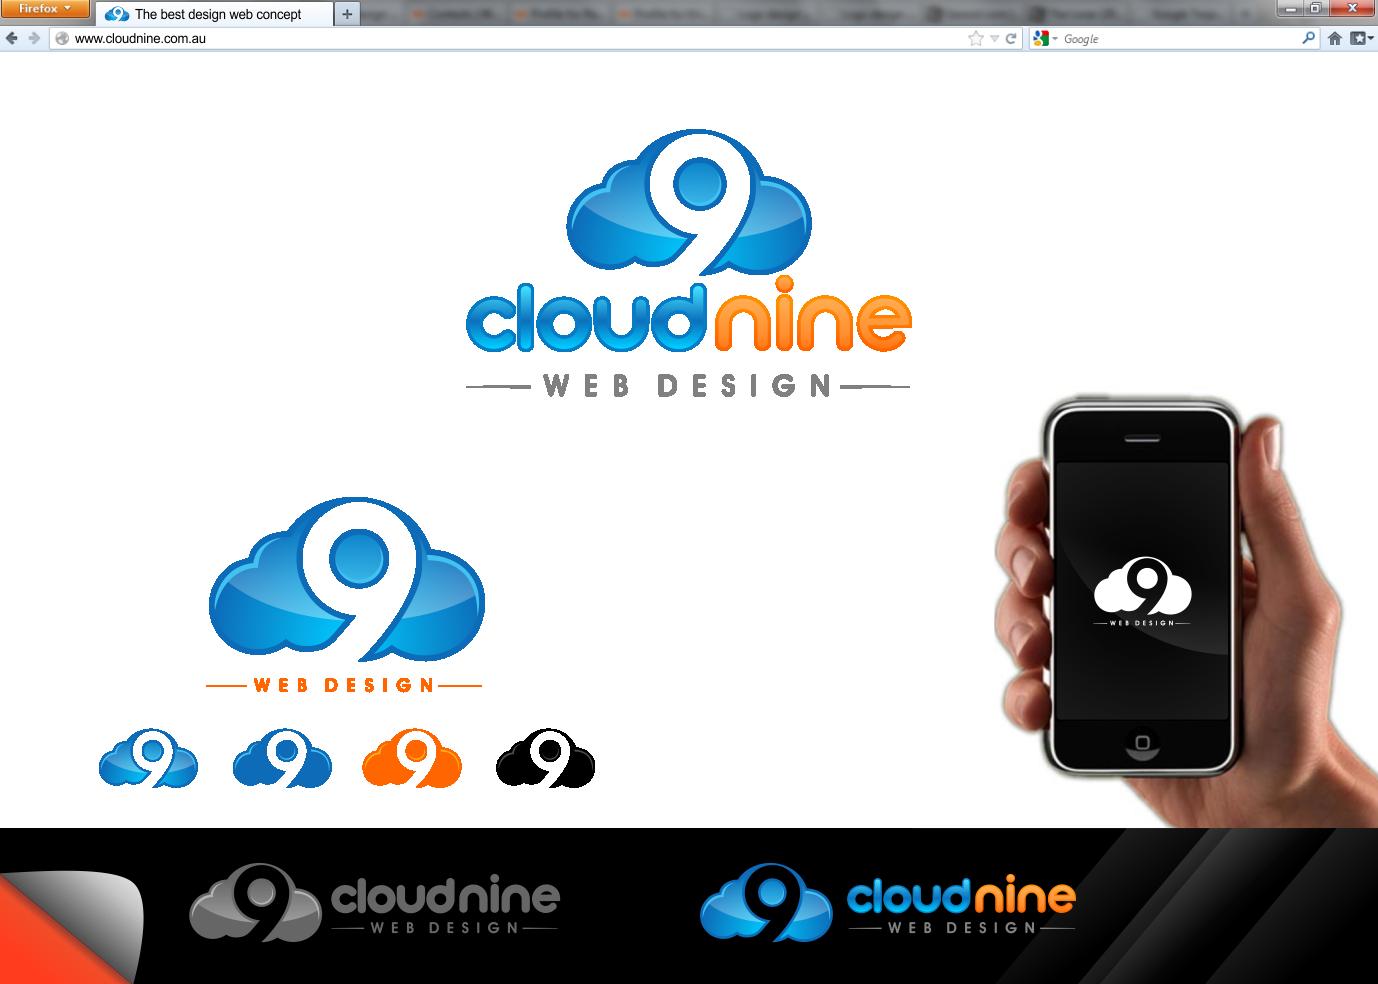 Cloud Nine Web Design needs a new logo